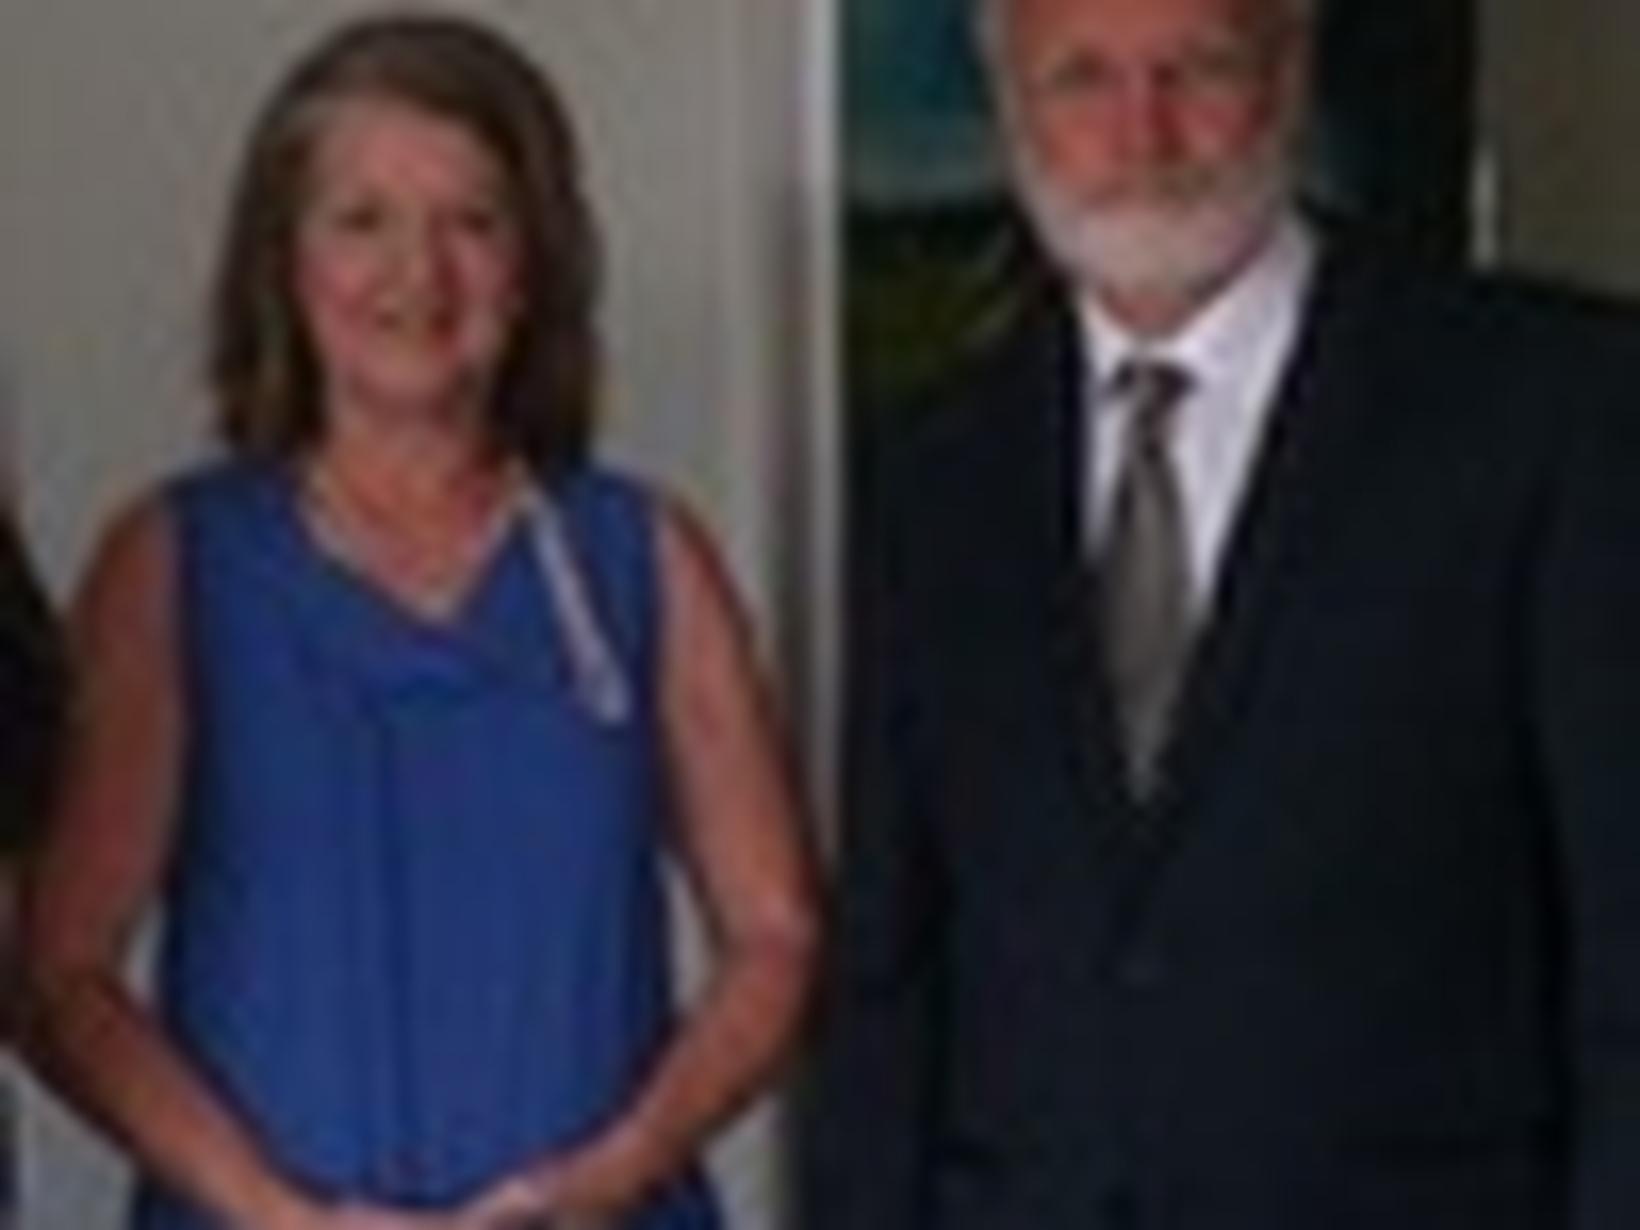 Jillian & Douglas william from Auckland, New Zealand